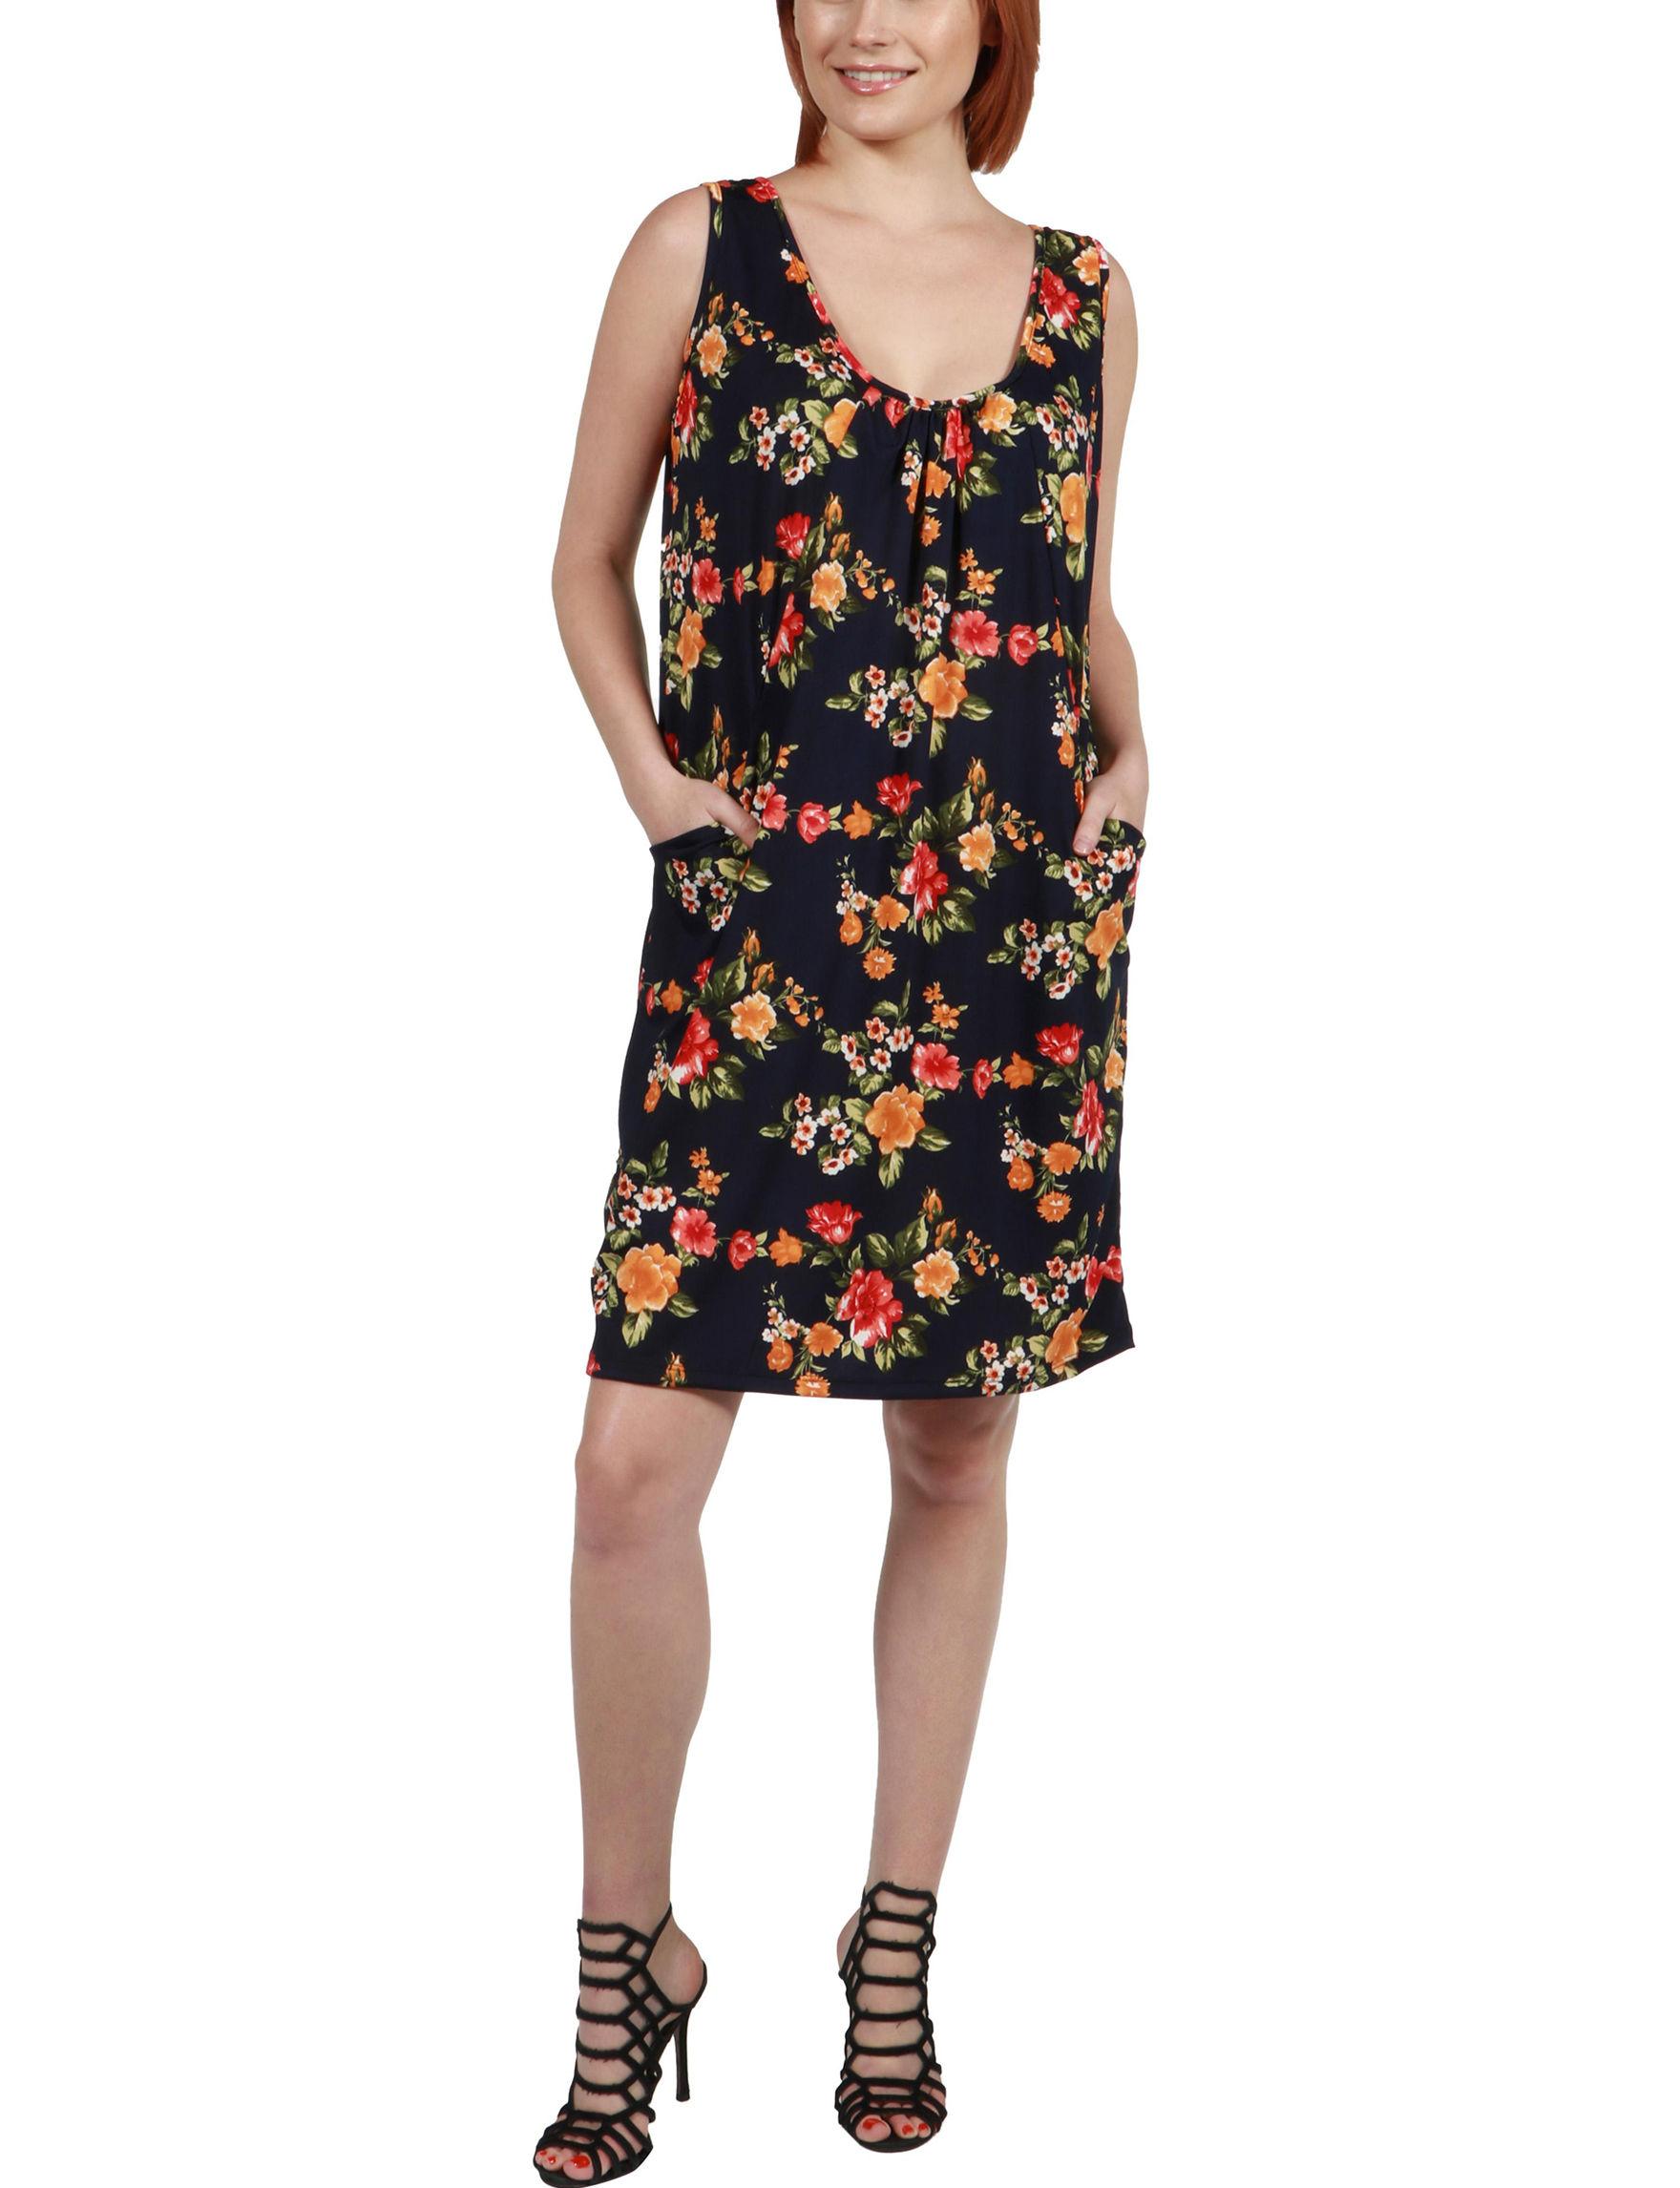 24Seven Comfort Apparel Black Multi Everyday & Casual Shift Dresses Sundresses